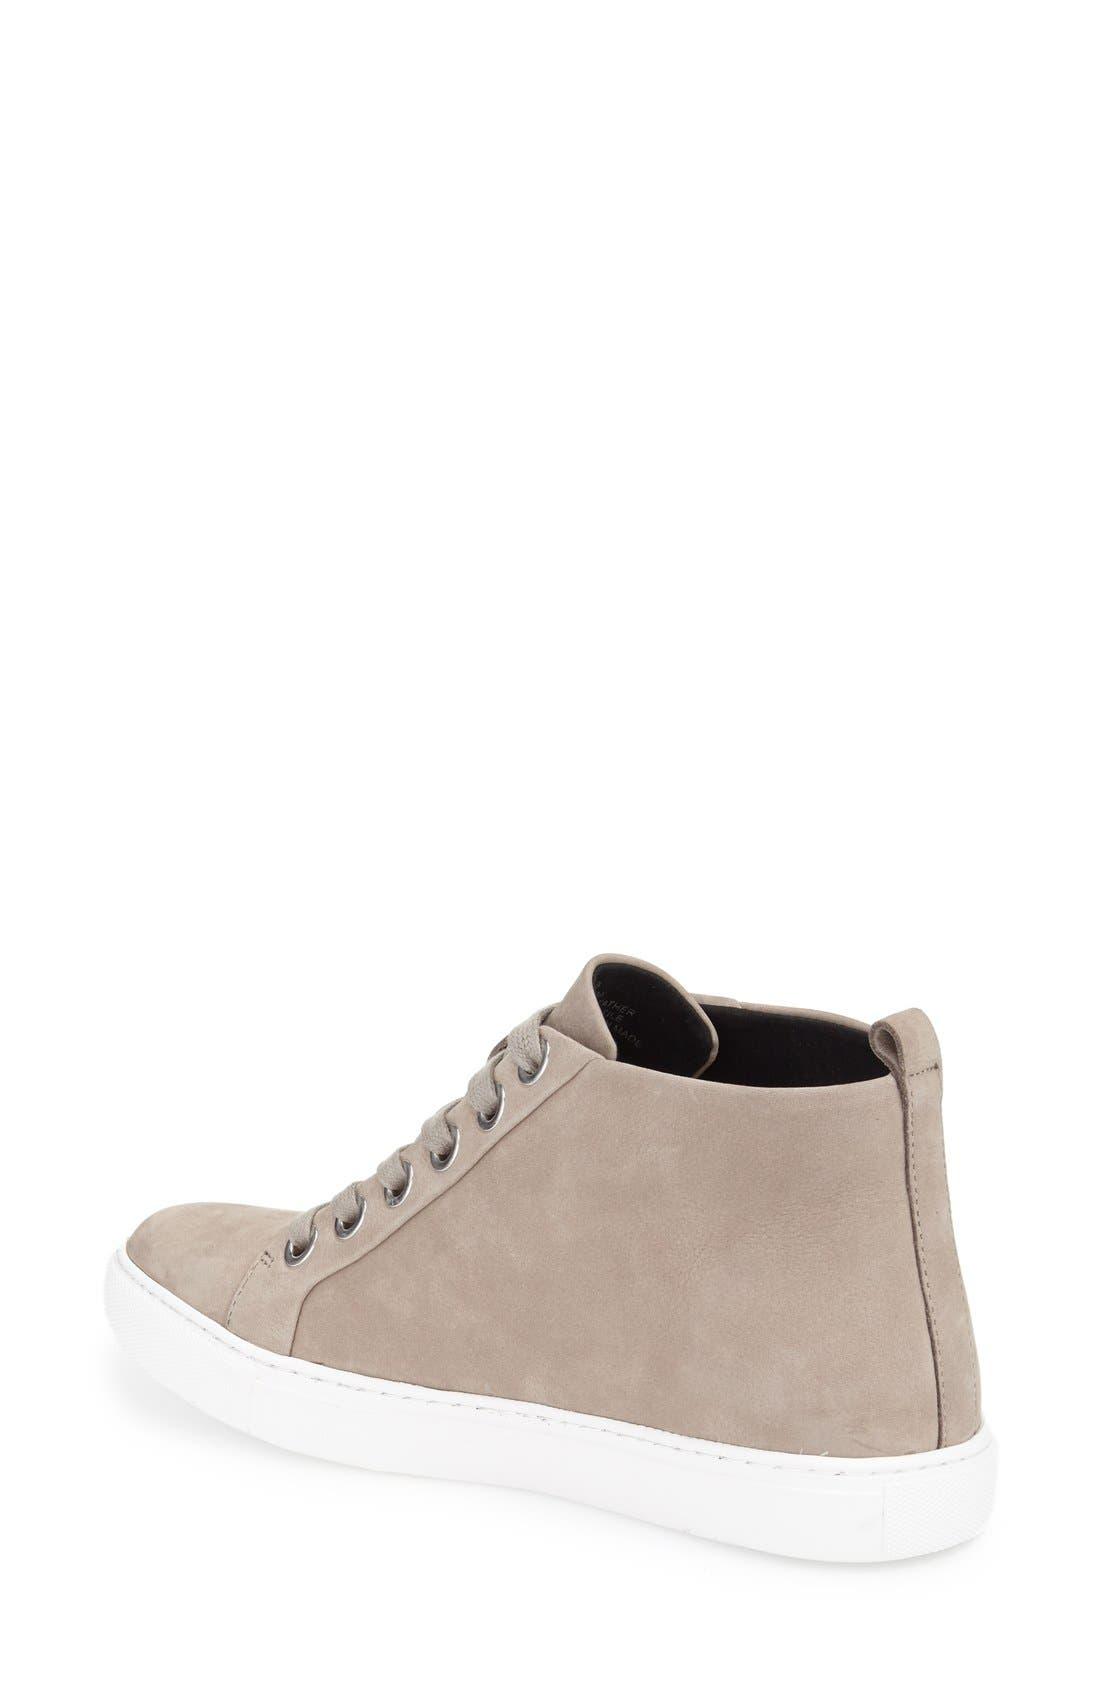 'Kaleb' High Top Sneaker,                             Alternate thumbnail 2, color,                             Cloud Nubuck Leather